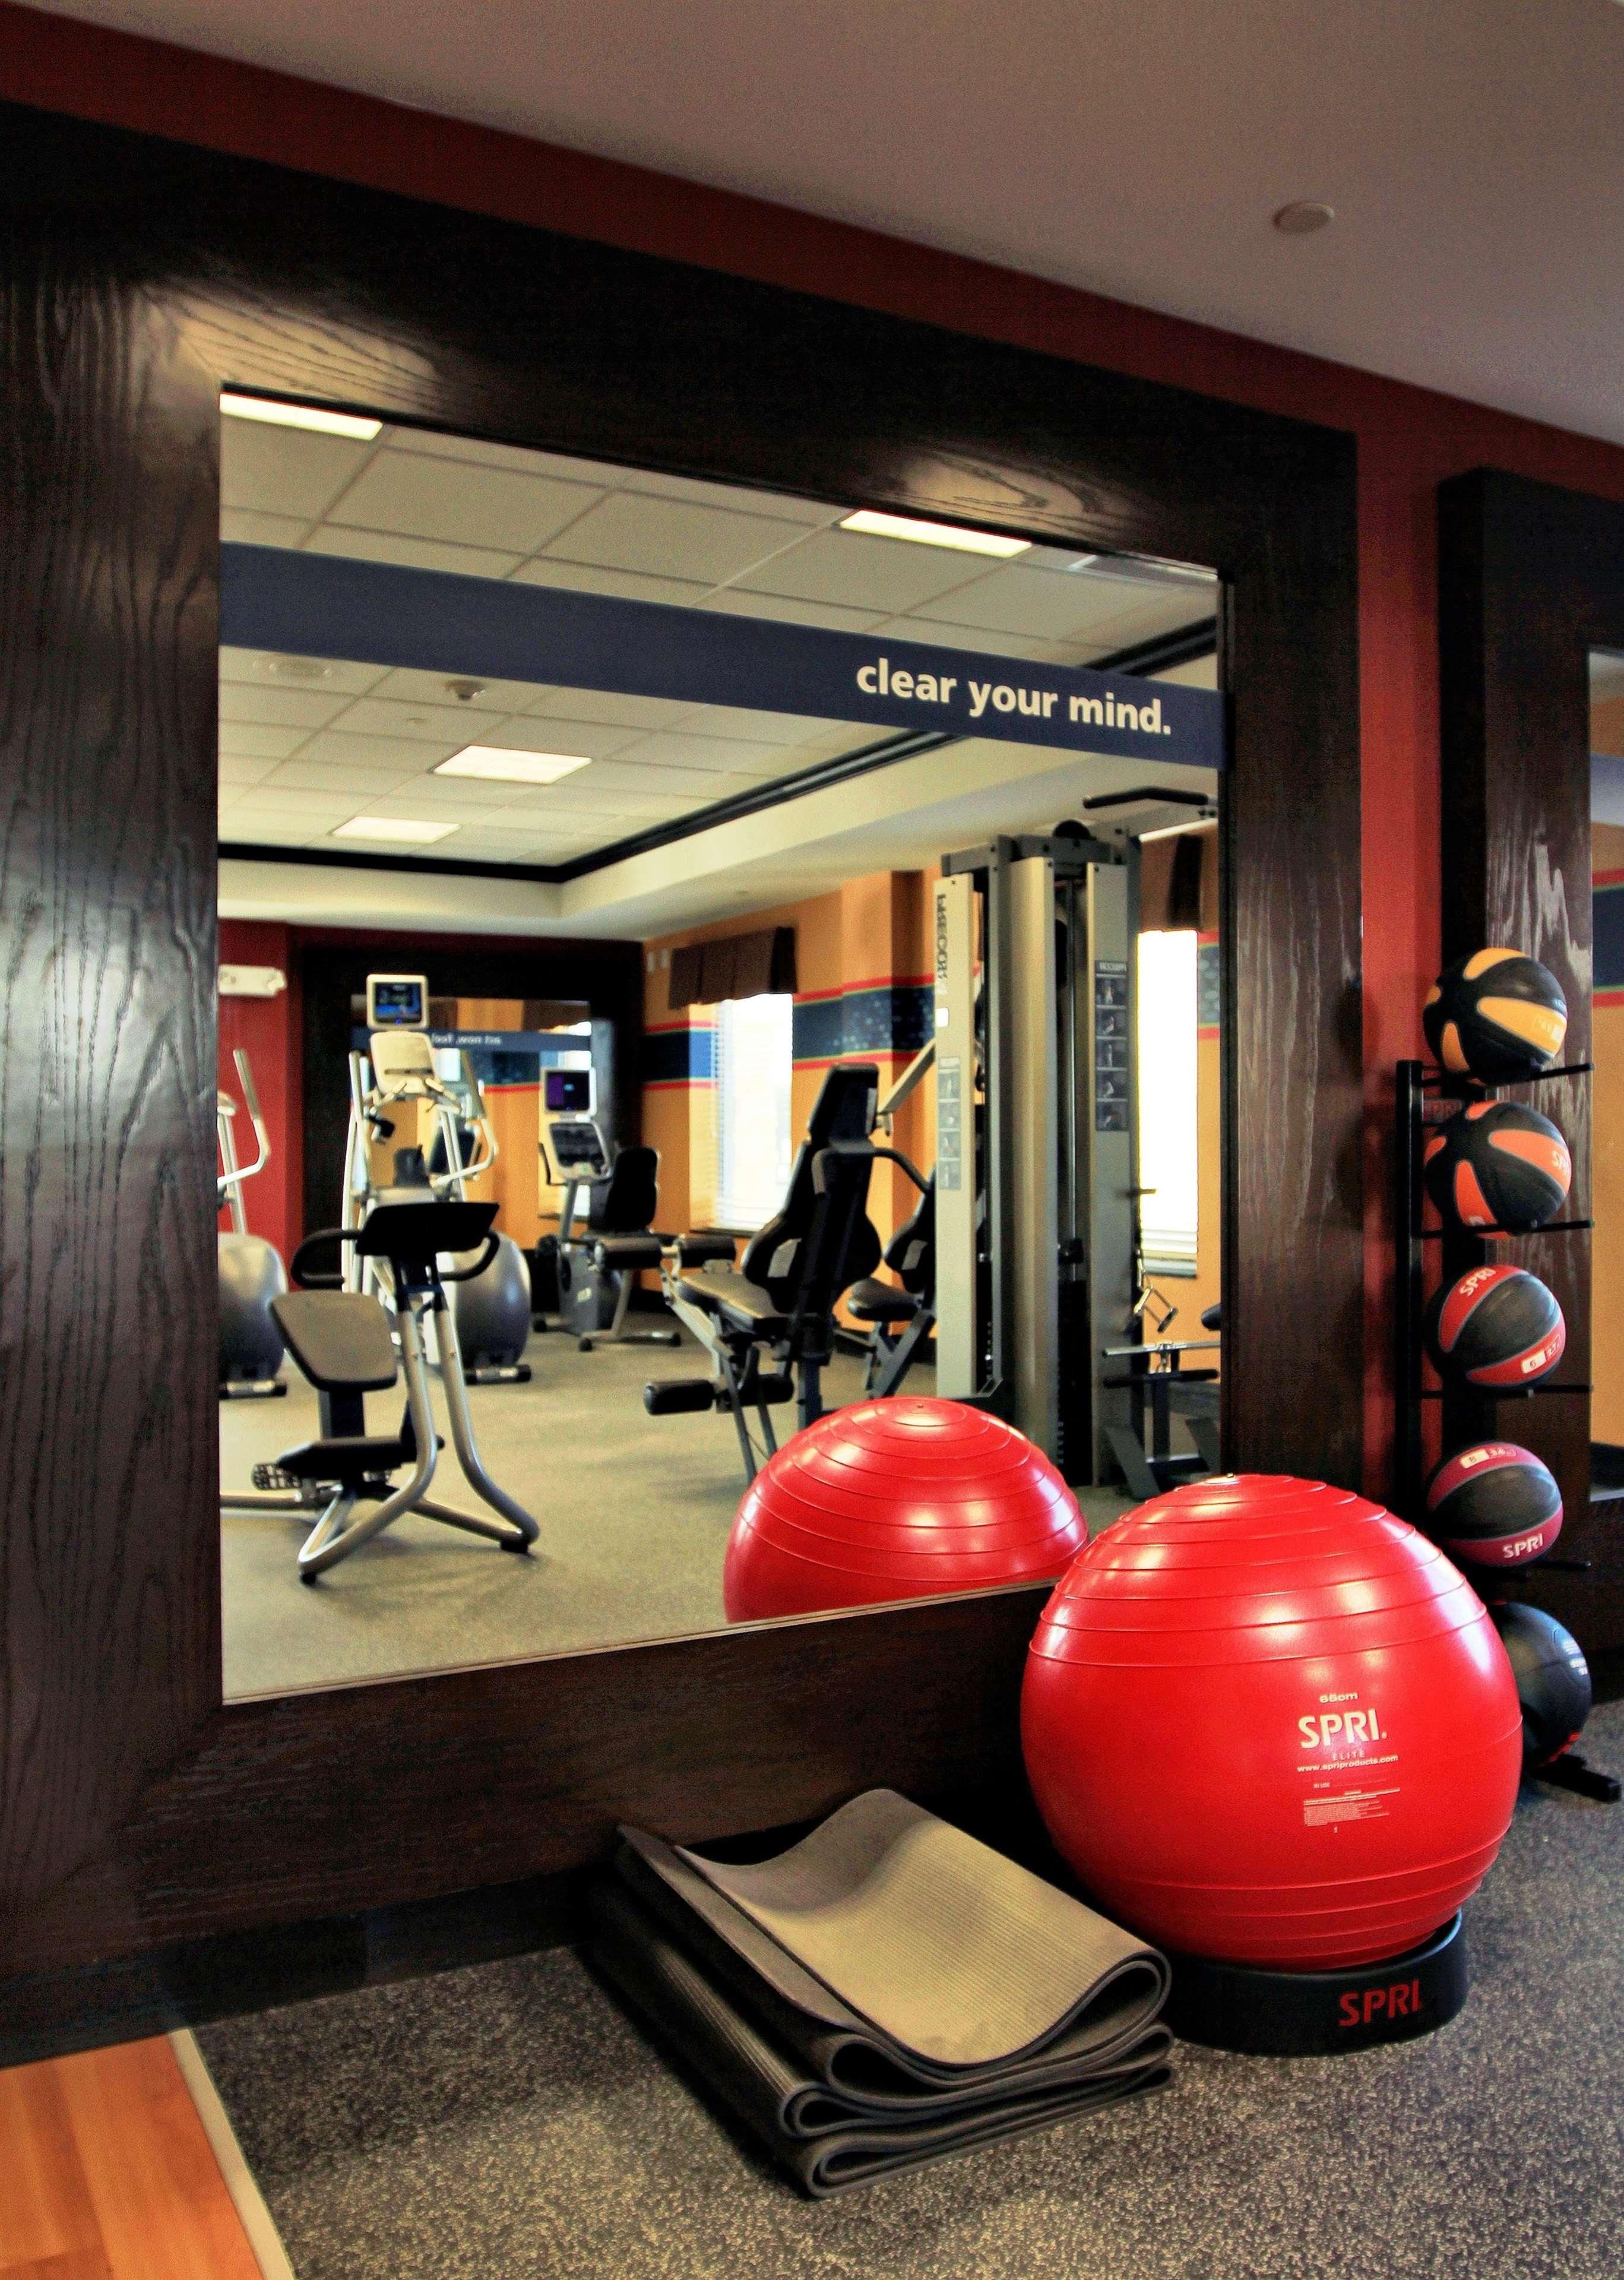 Hampton Inn & Suites Dallas/Lewisville-Vista Ridge Mall, TX image 12